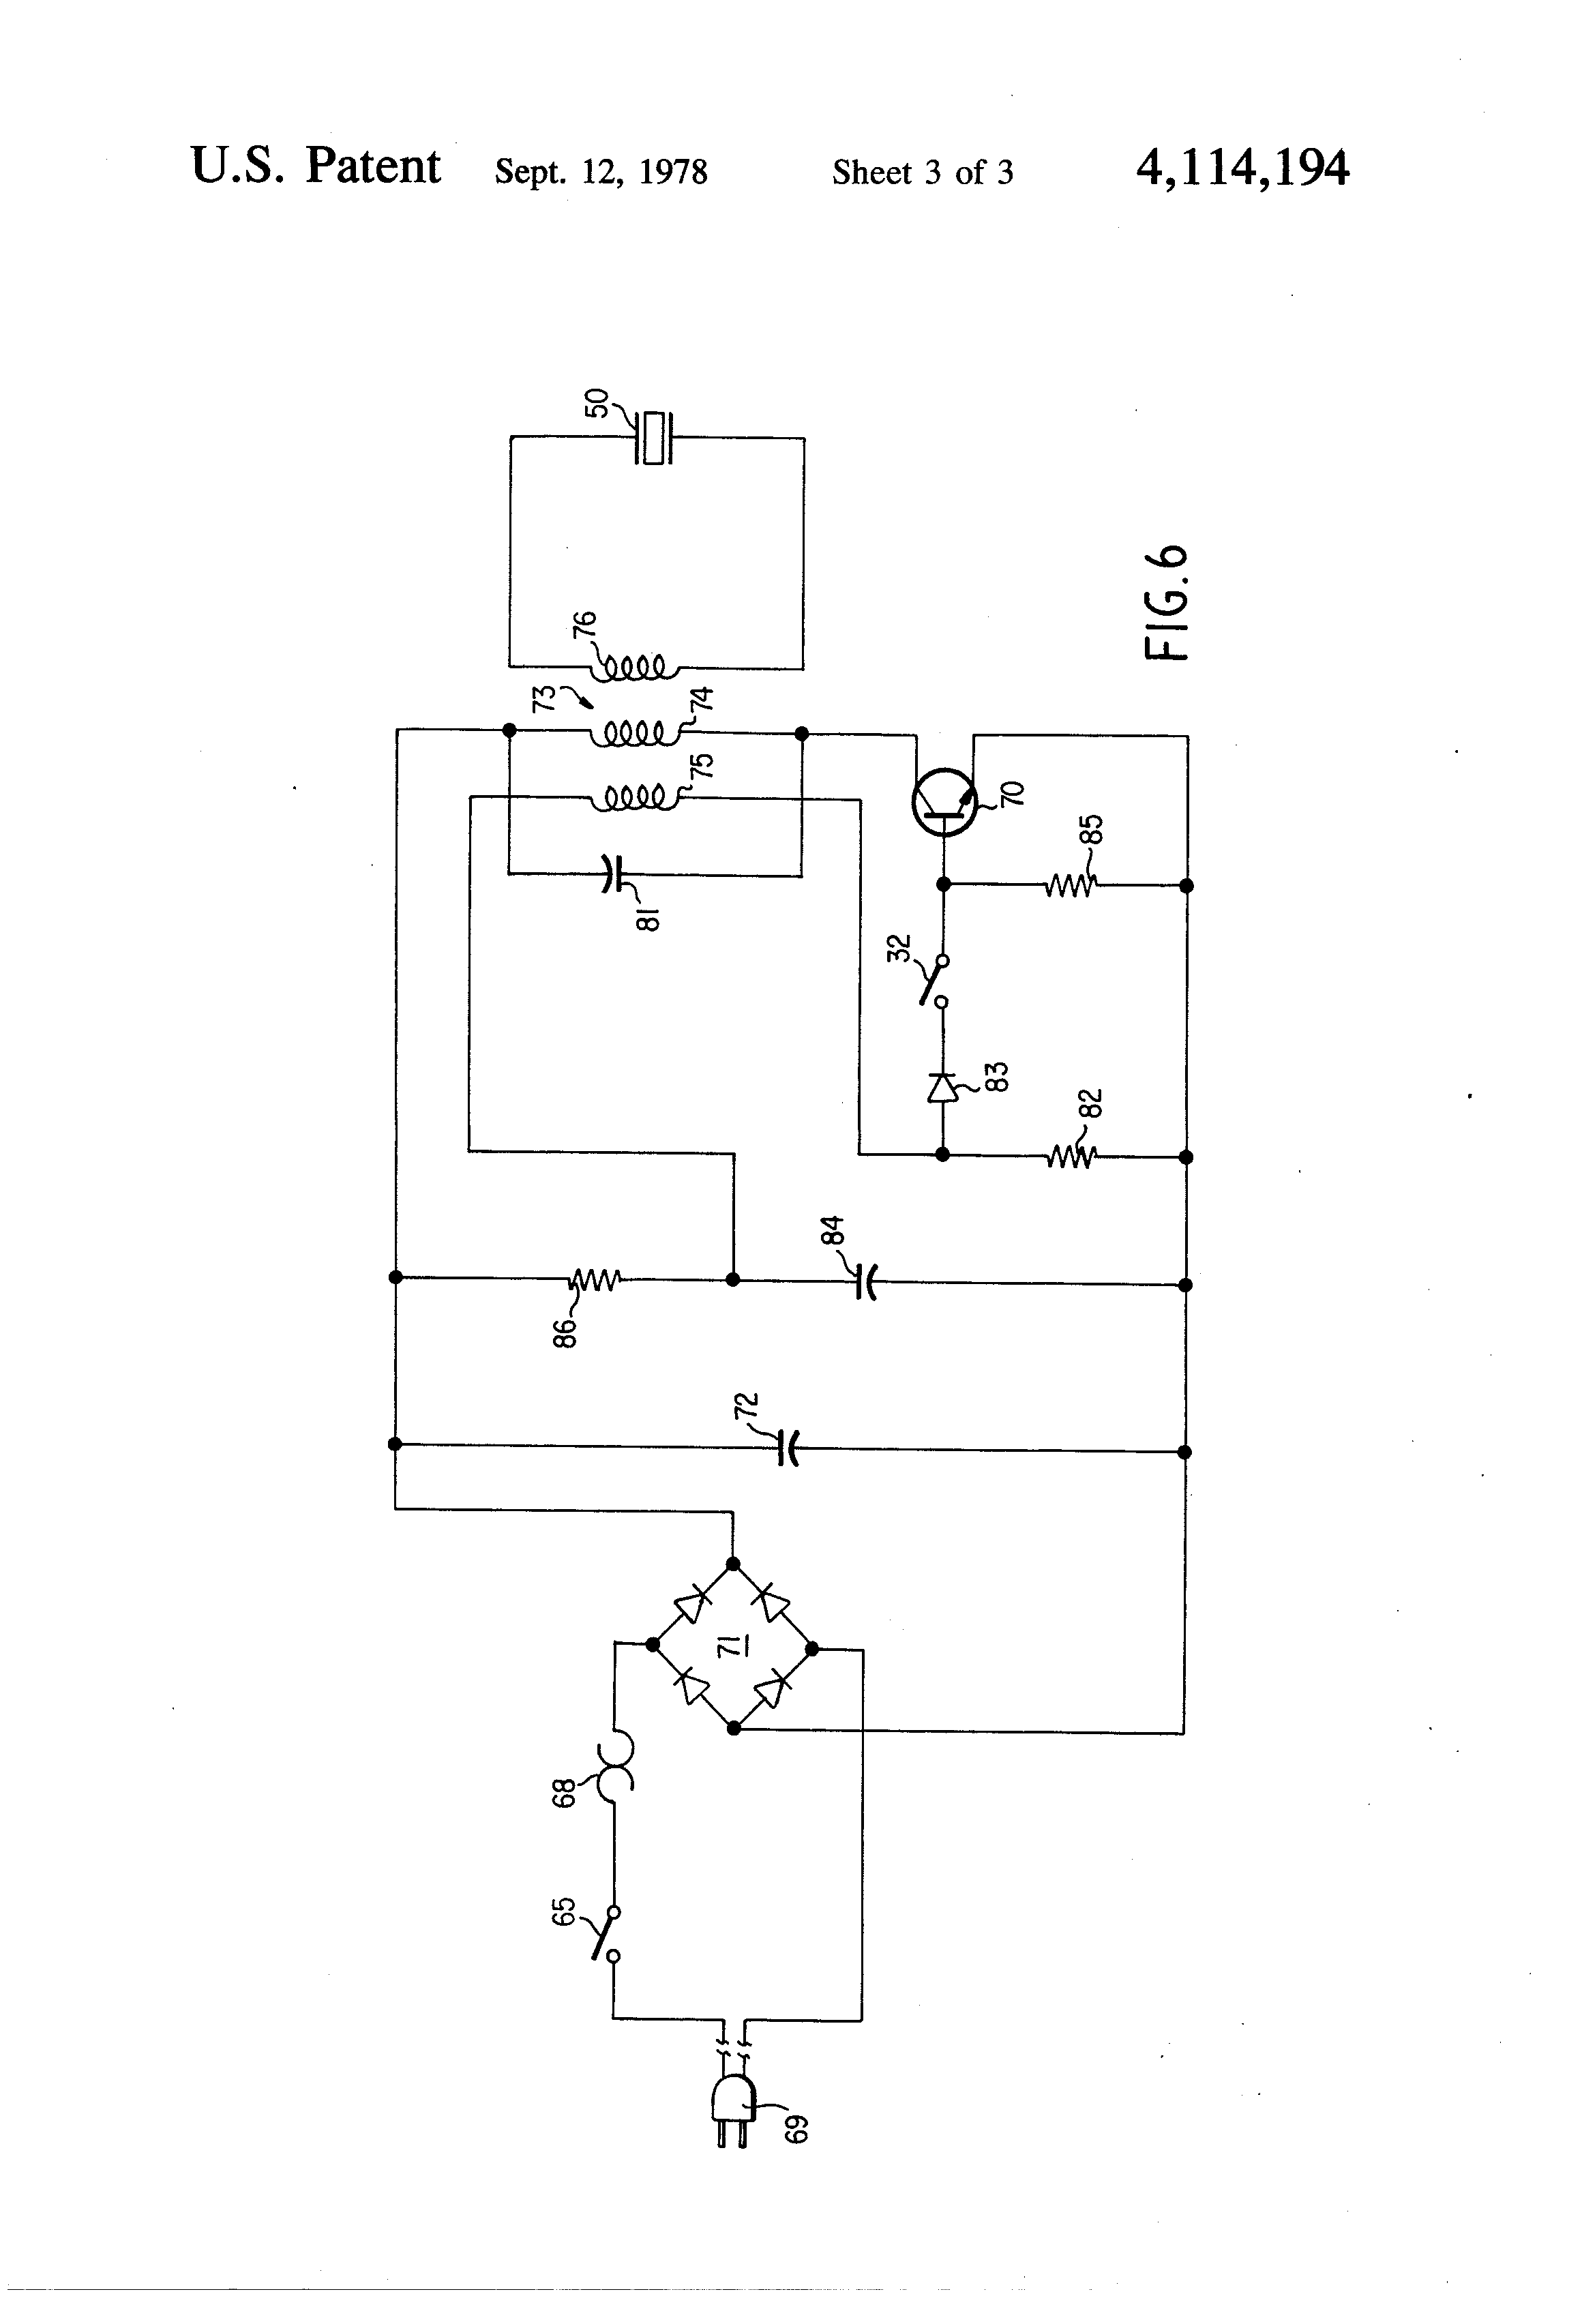 Ultrasonic Cleaner Circuit Diagram | Oscillatory Circuit For Ultrasonic Cleaning Apparatus Google Patents